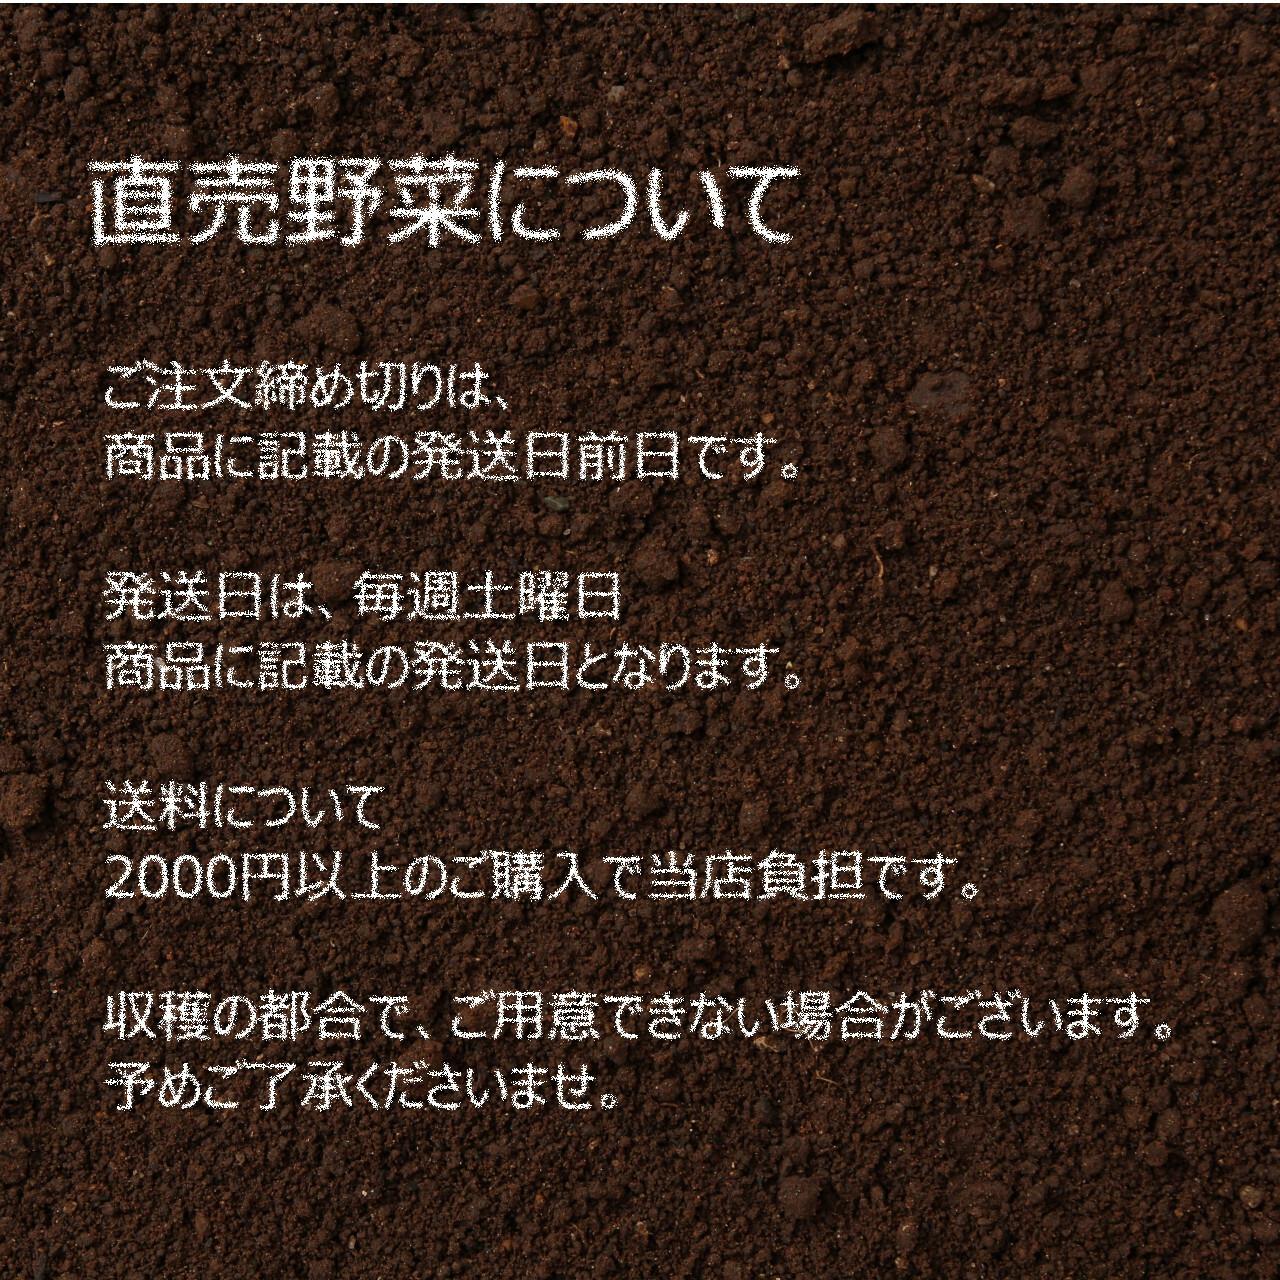 6月の朝採り直売野菜 : 大根菜 約300g 新鮮な春野菜 6月6日発送予定